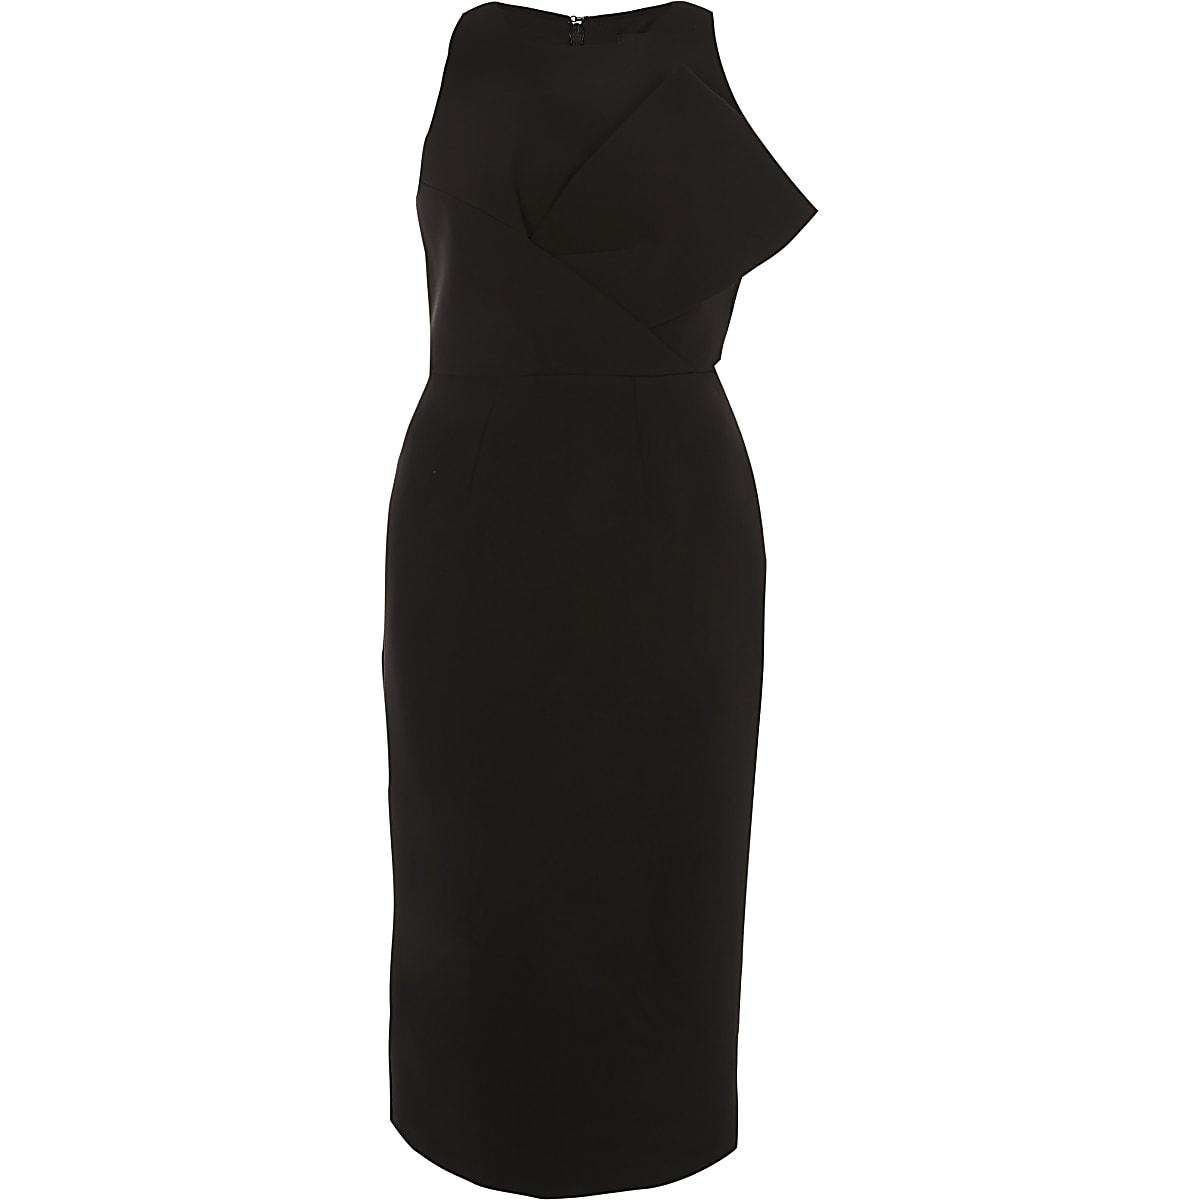 Black bow front sleeveless bodycon dress